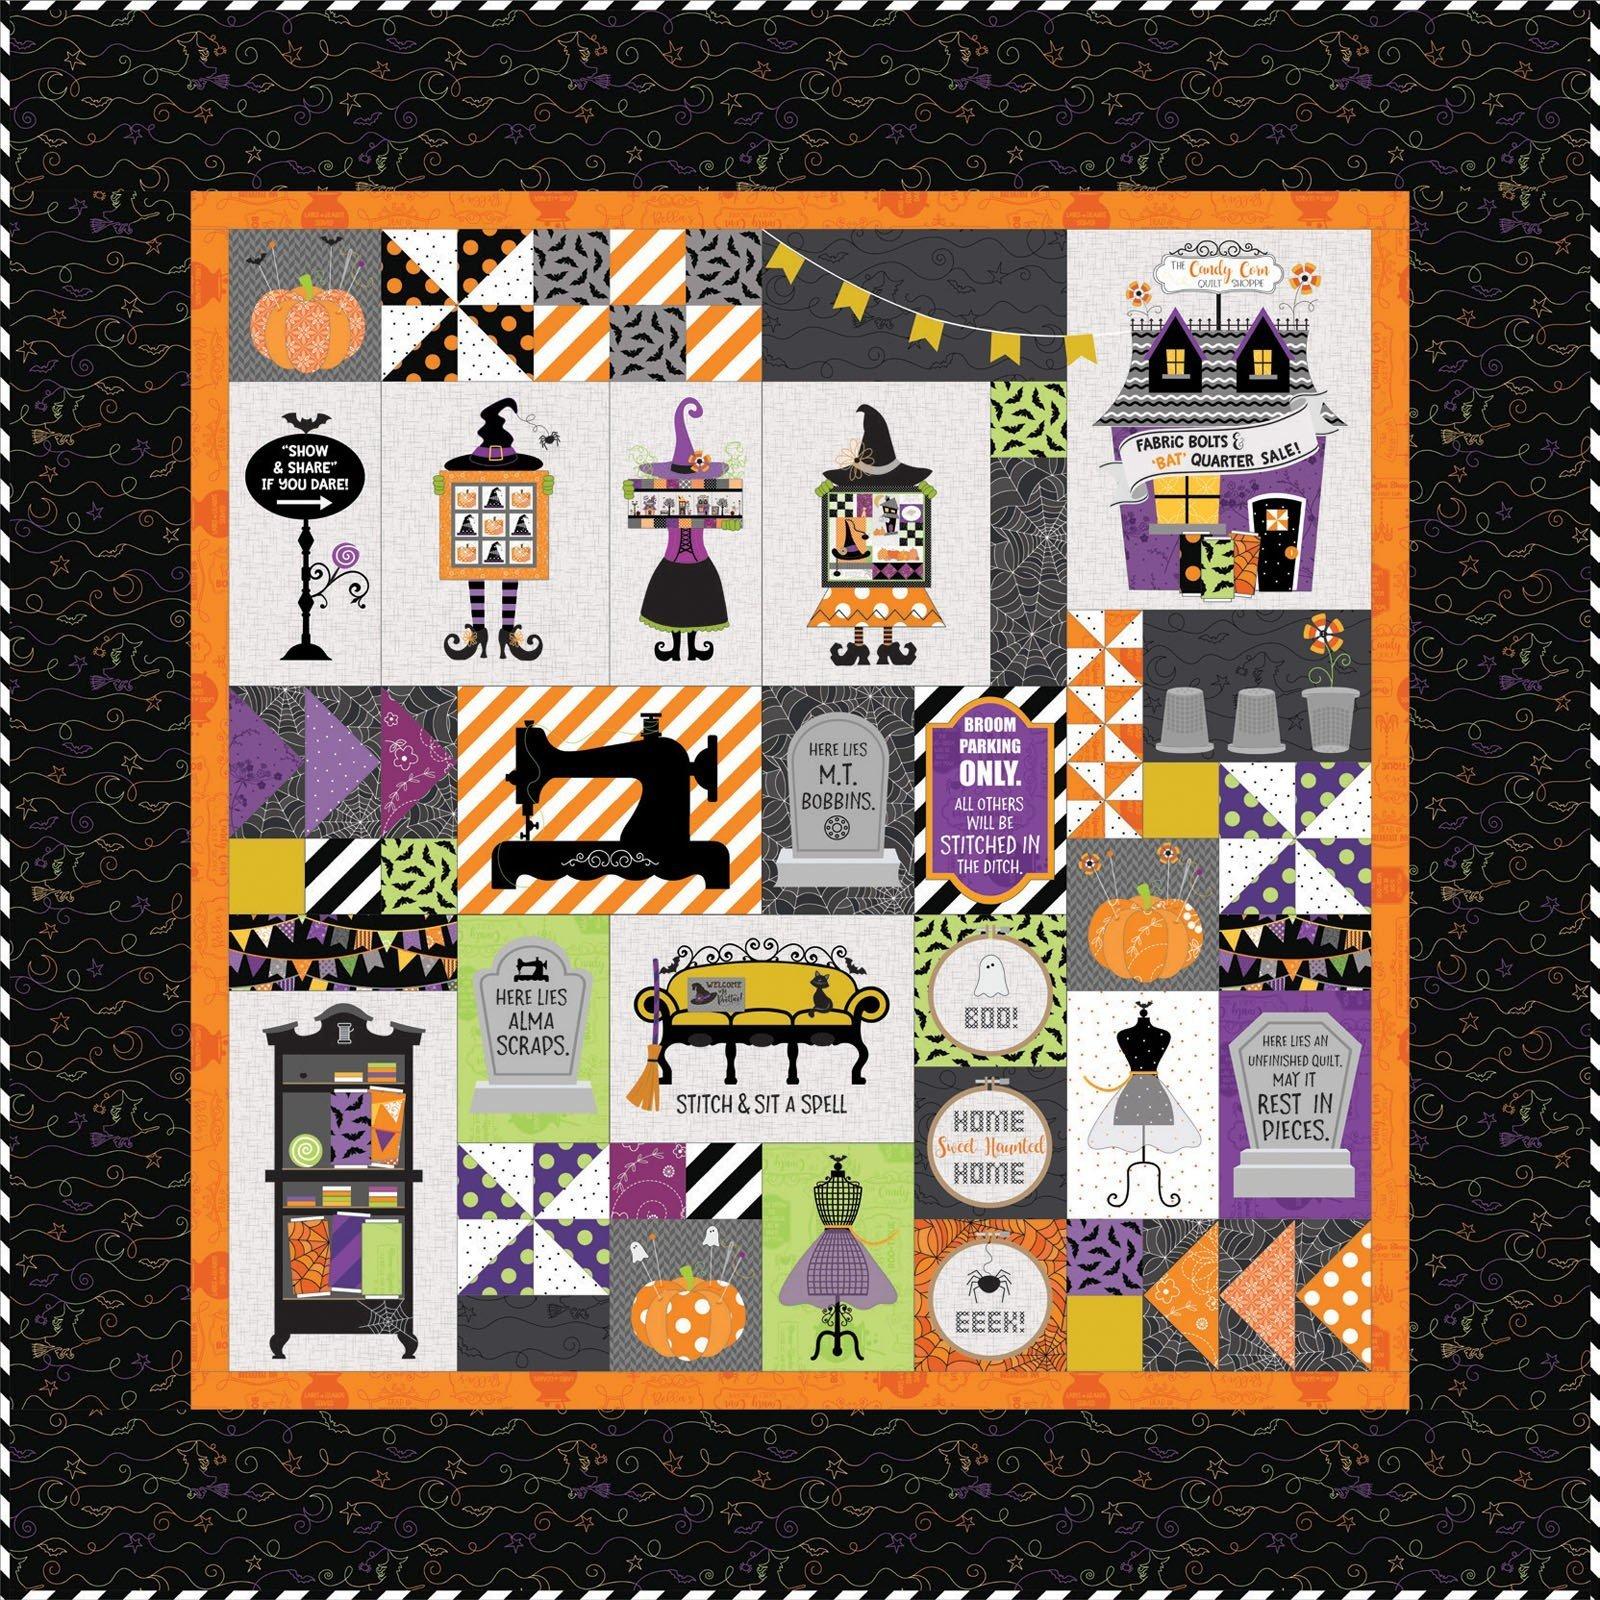 Kimberbell Candy Corn Quilt Shoppe Quilt Kit - Presale